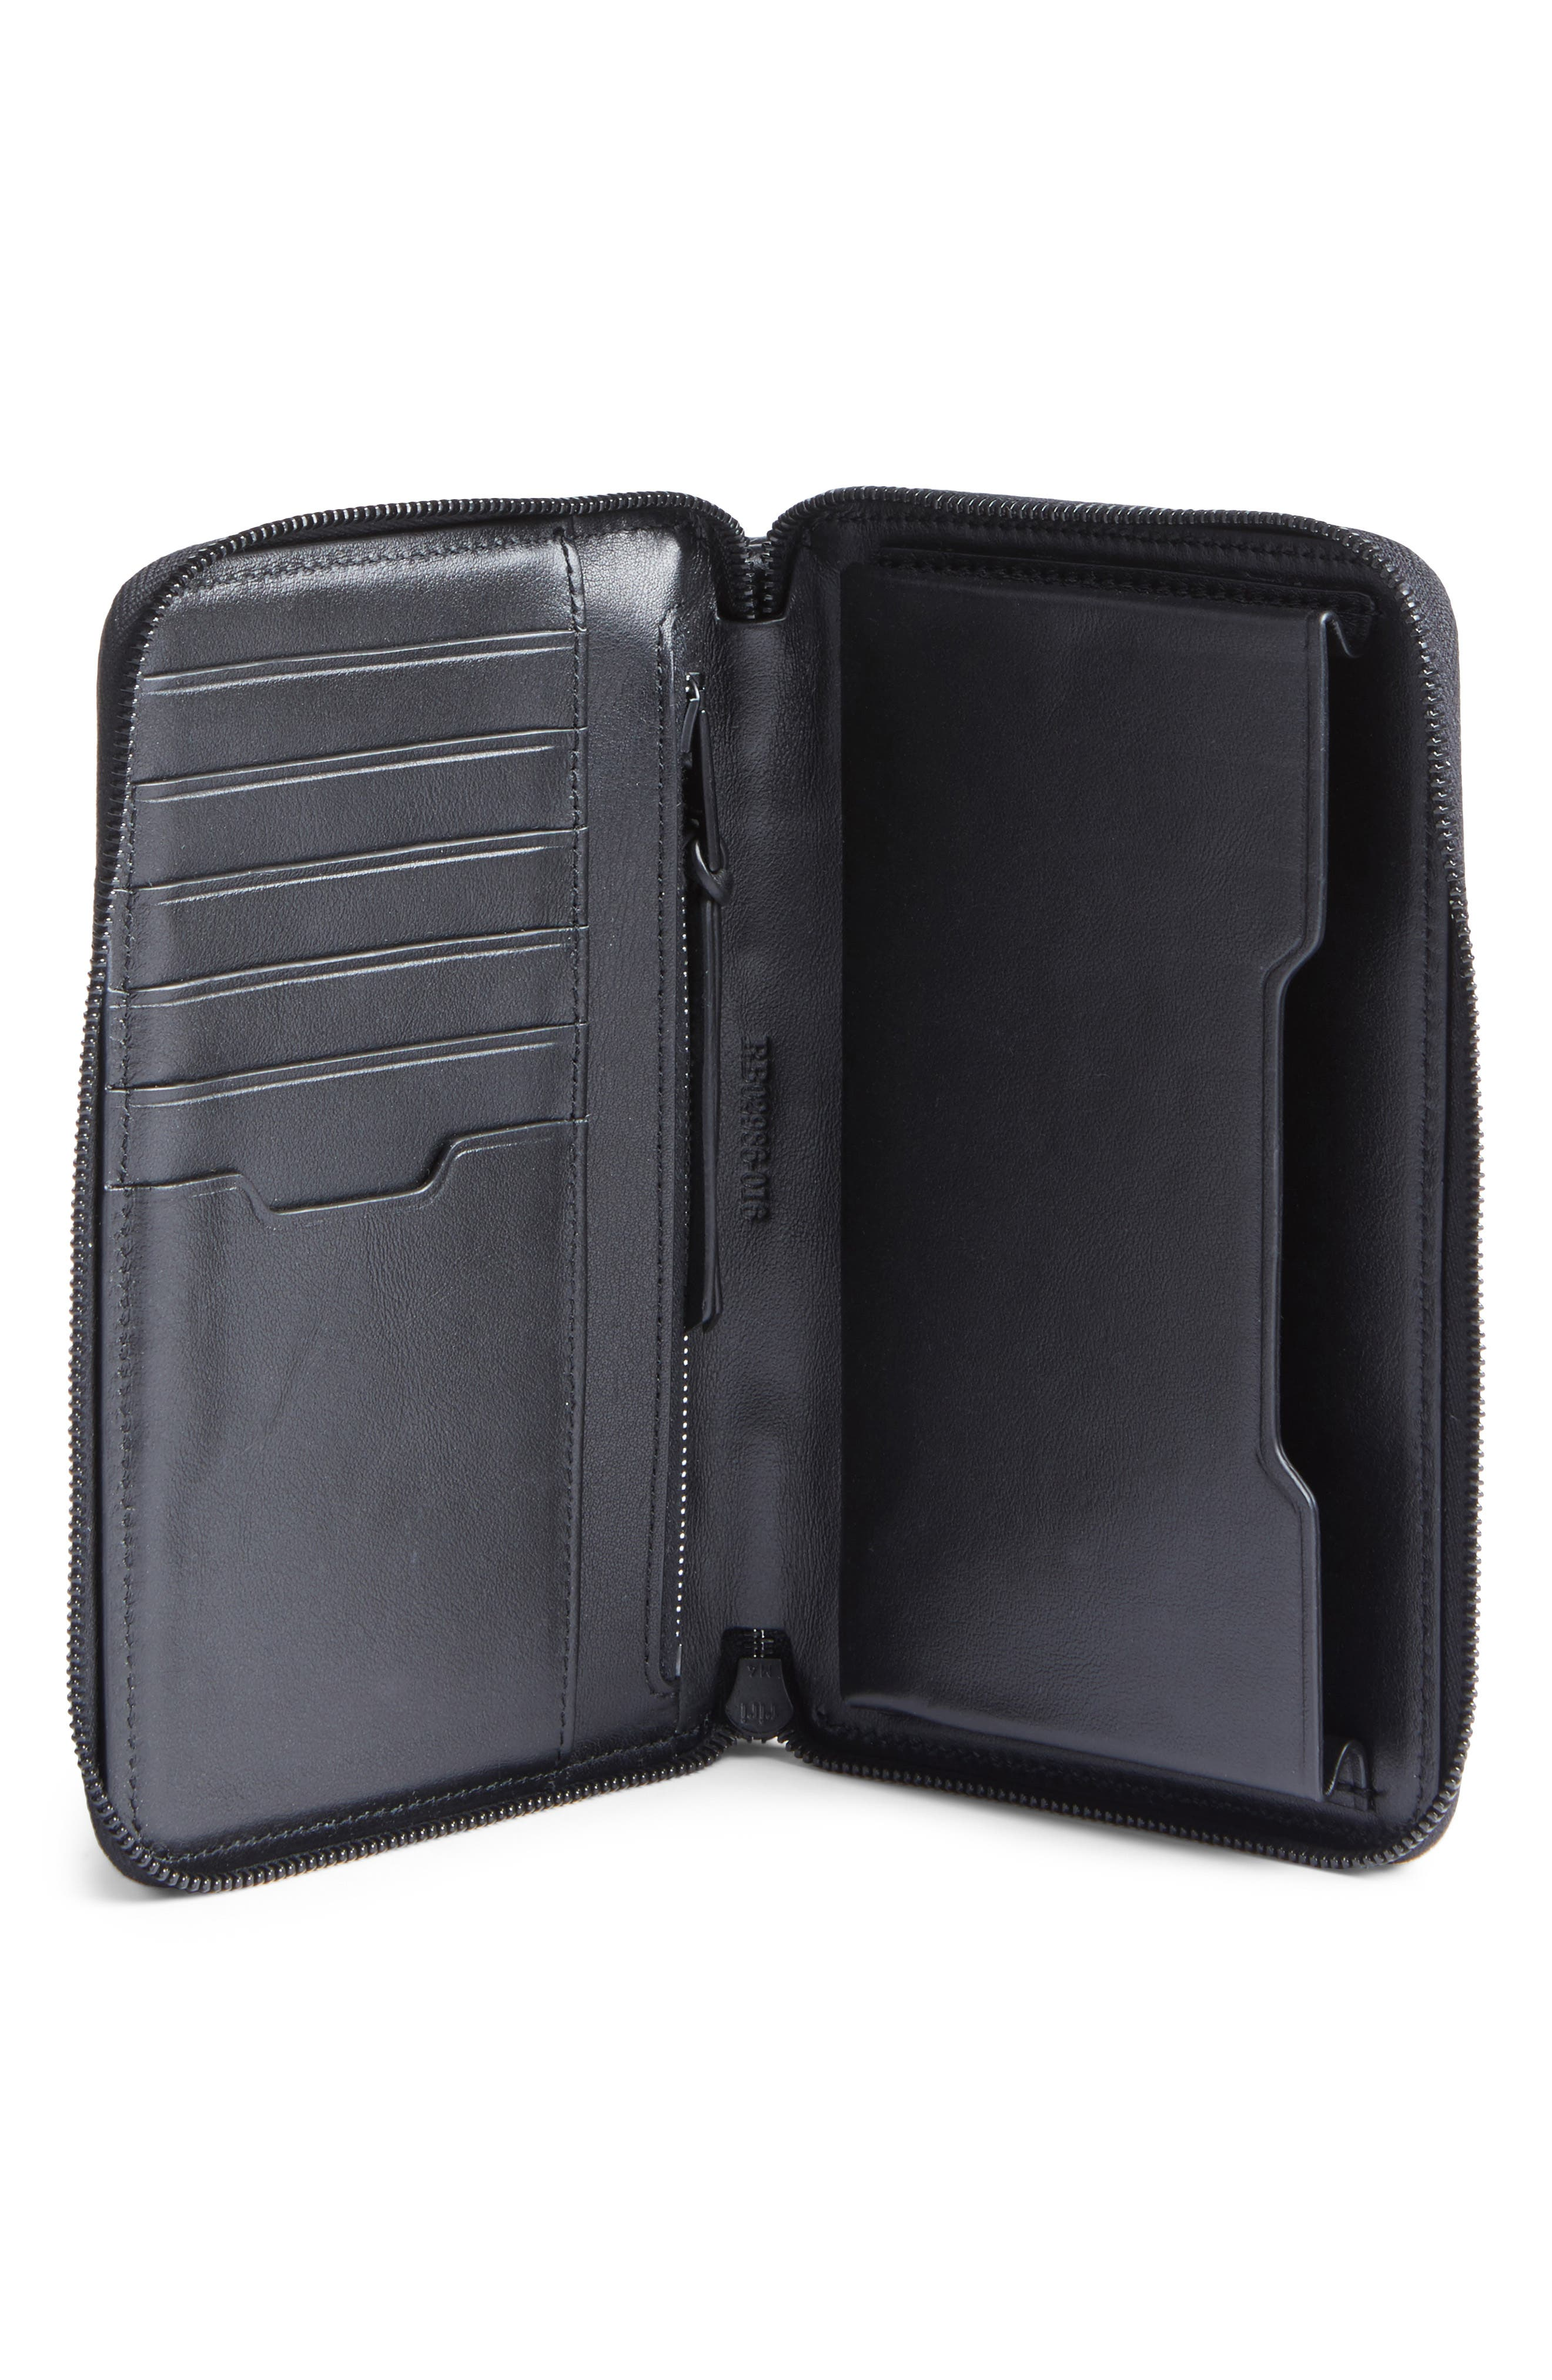 Devon Metallic Buffalo Leather Phone Wallet,                             Alternate thumbnail 2, color,                             Gunmetal